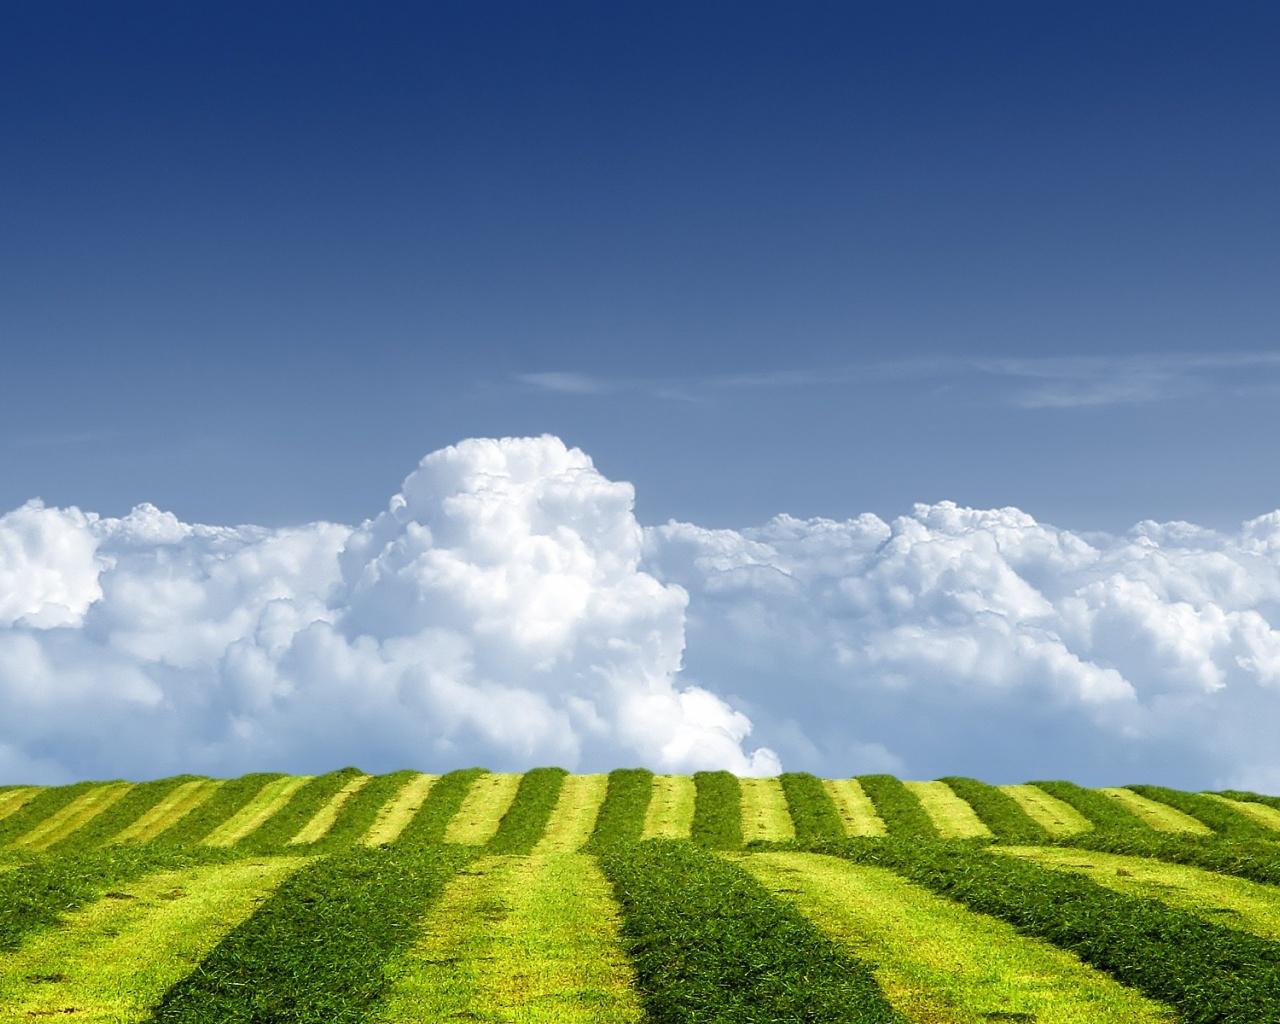 ws_Grass_Green_Field_Over_Clouds_1280x1024